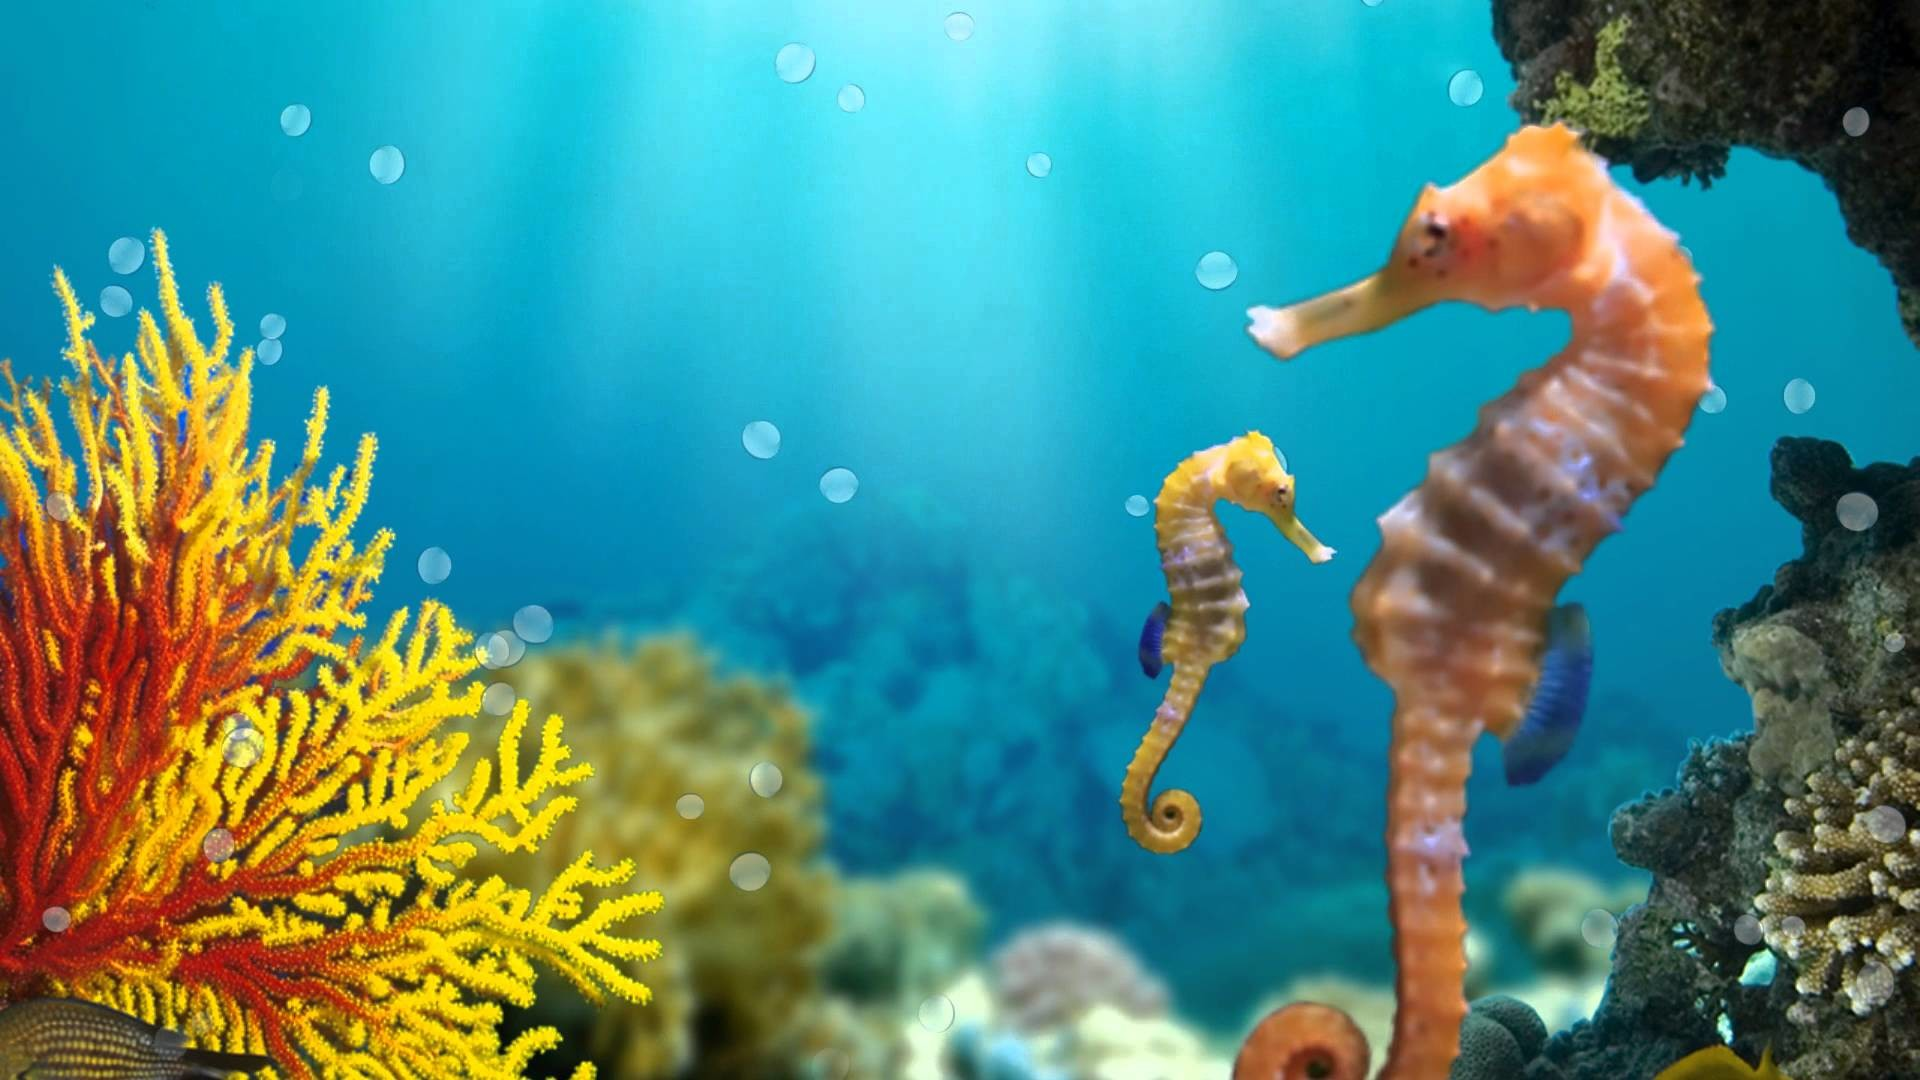 Animated Fish Tank Wallpaper Seahorse Wallpaper 183 ①